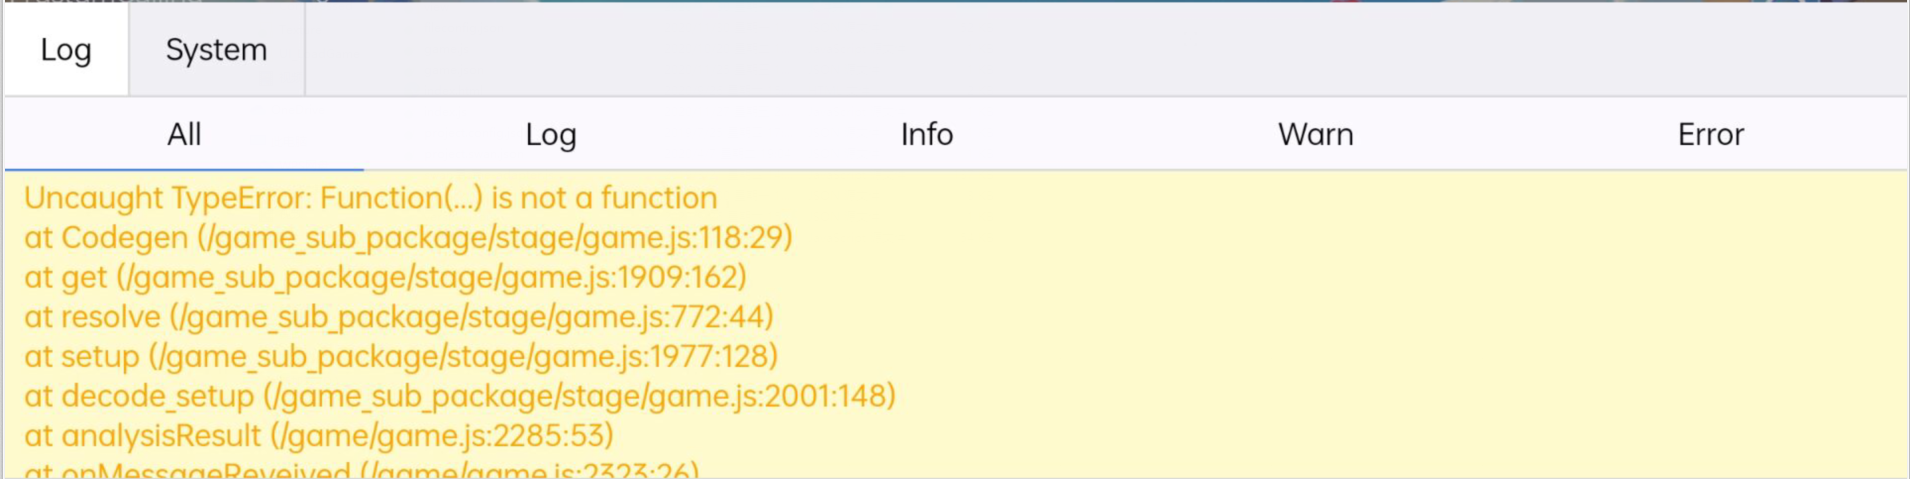 QQ截图20201201143837.png